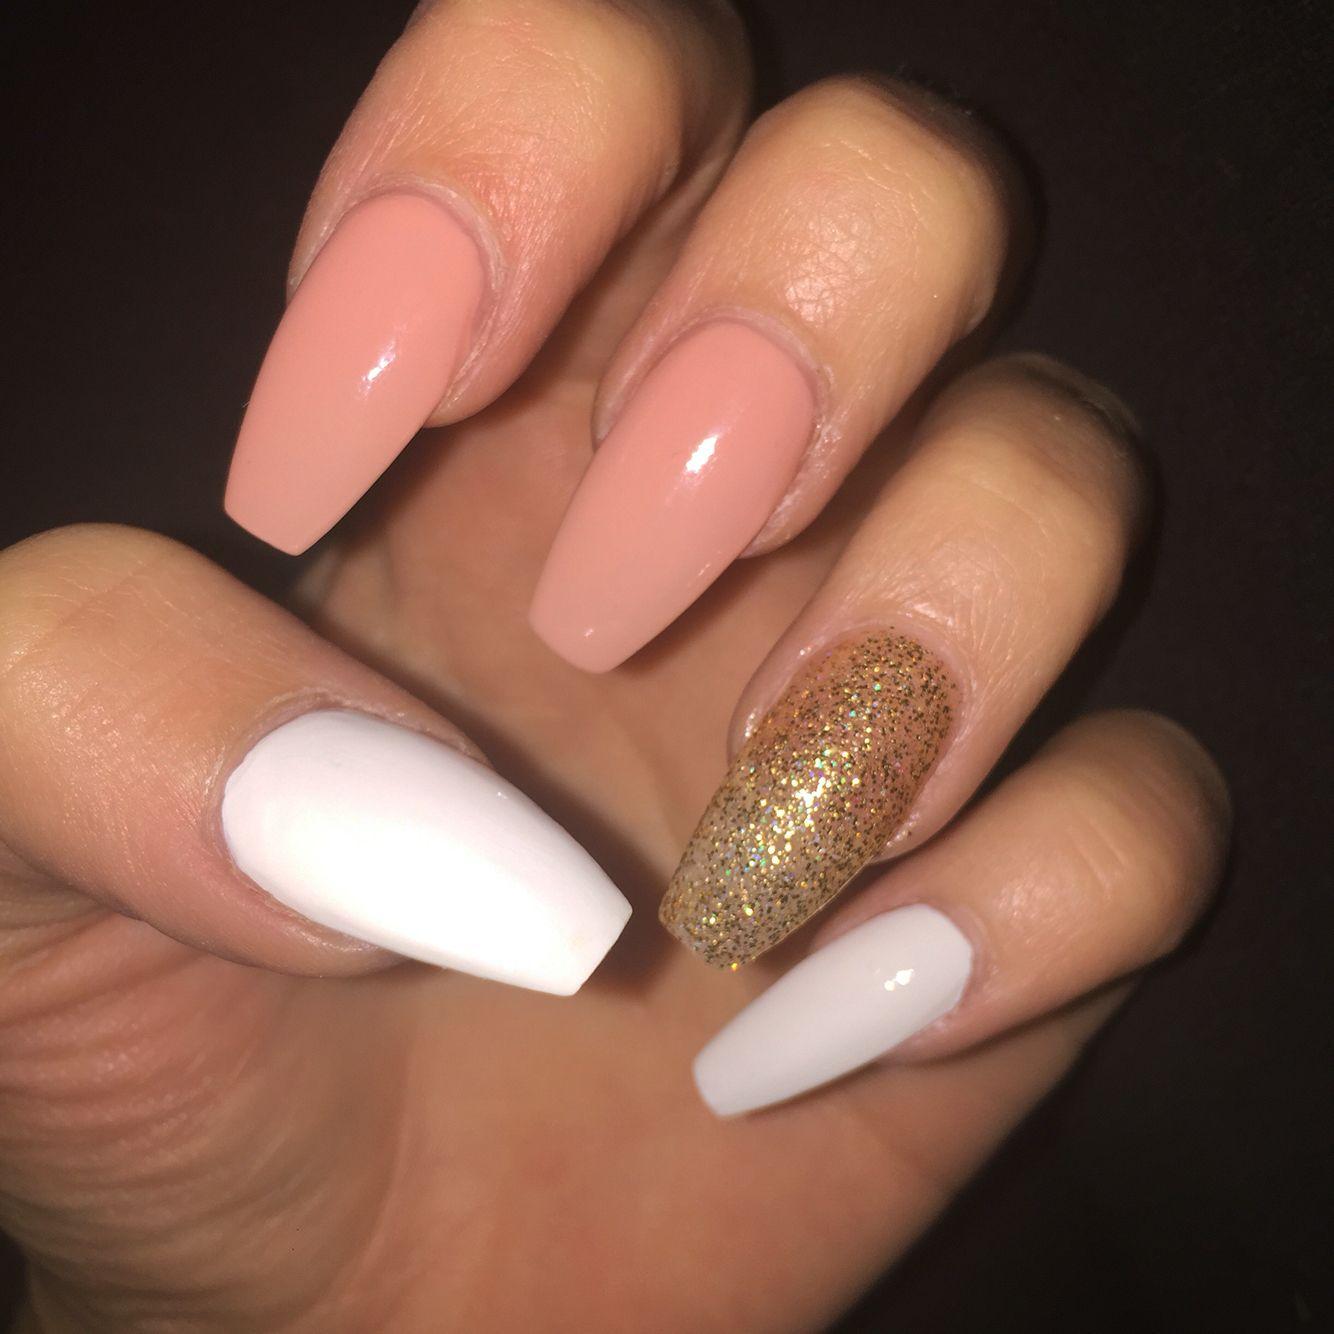 Simple nails | Nails | Pinterest